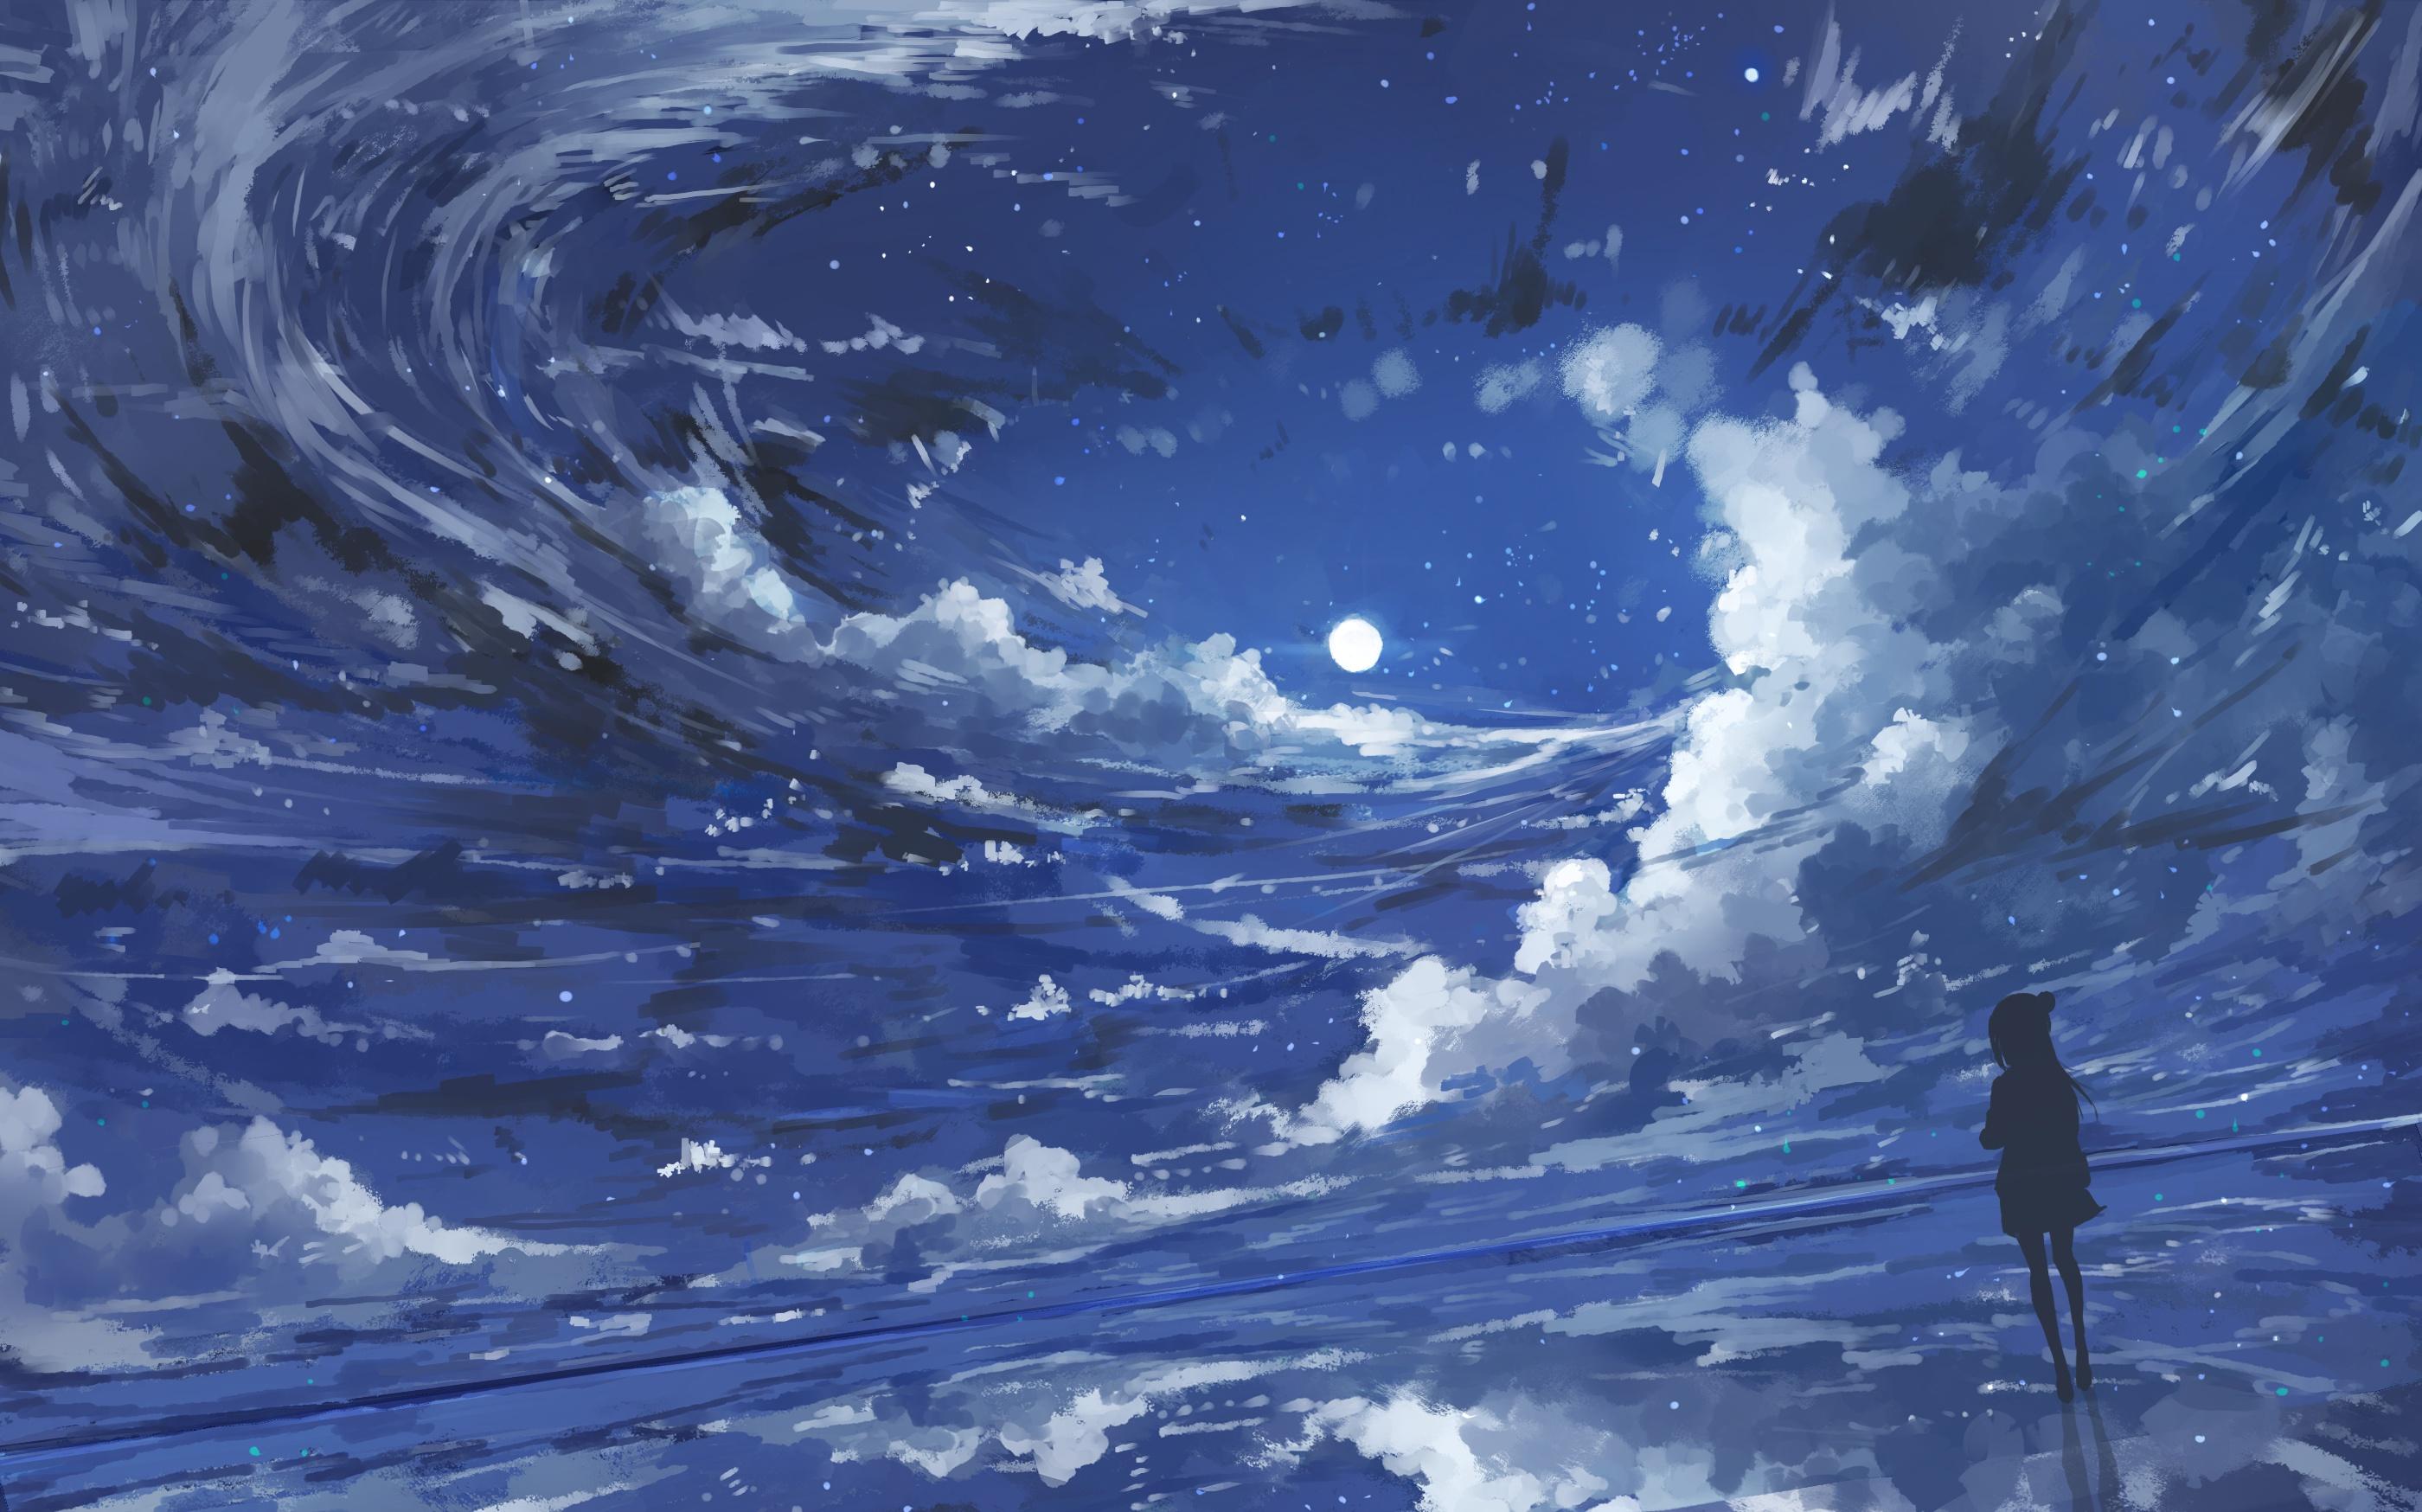 Anime 2800x1748 illustration children night Moon clouds painting digital art